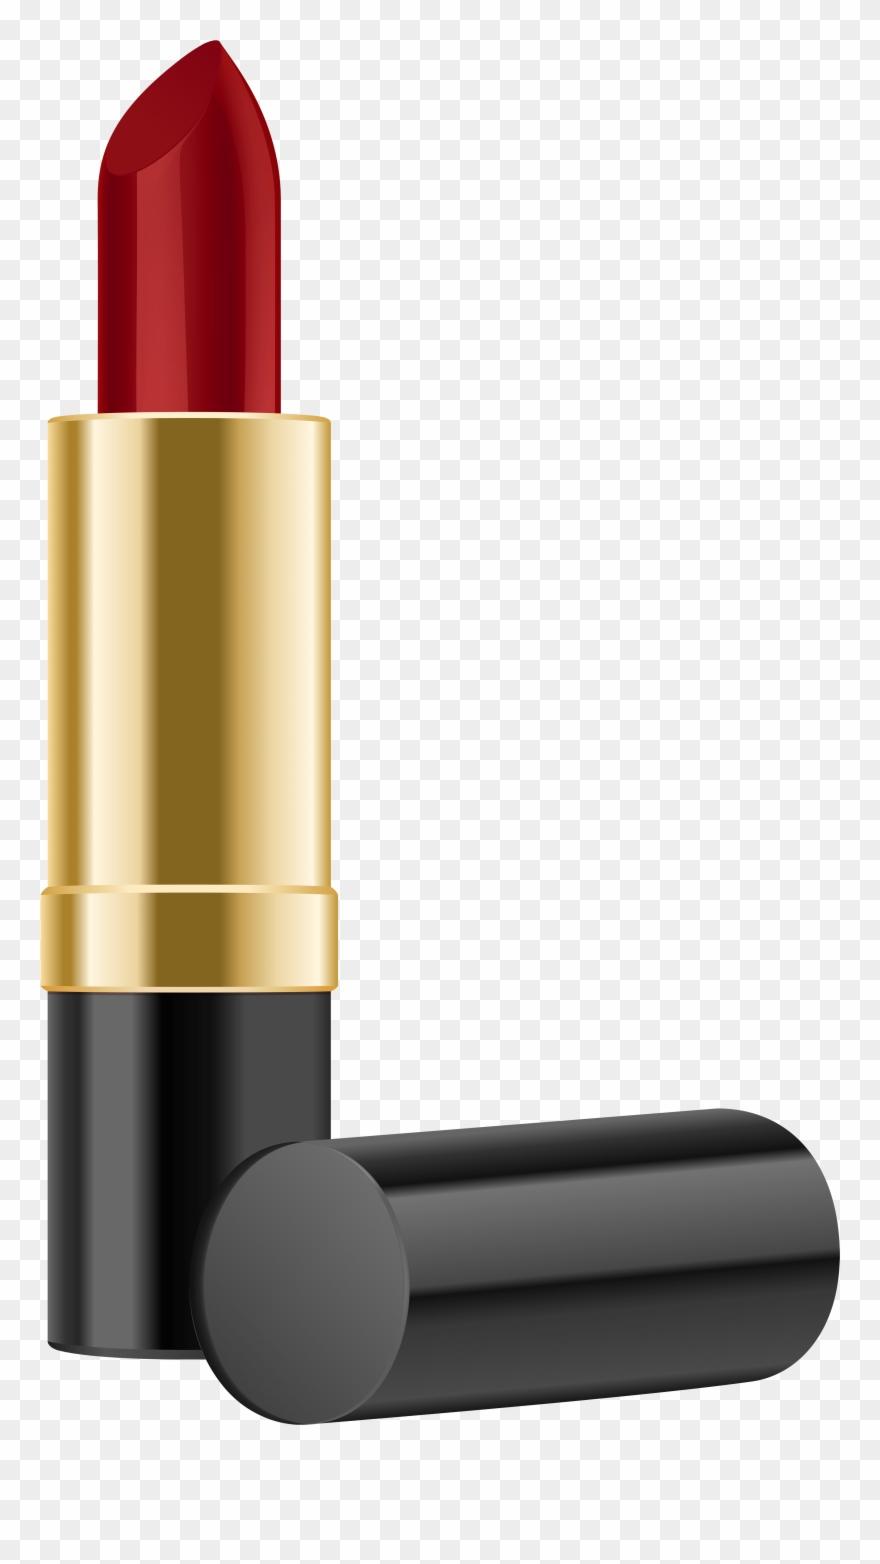 Chanel lipstick clipart graphic library library Chanel Lipstick Clipart - Png Download (#1476578) - PinClipart graphic library library